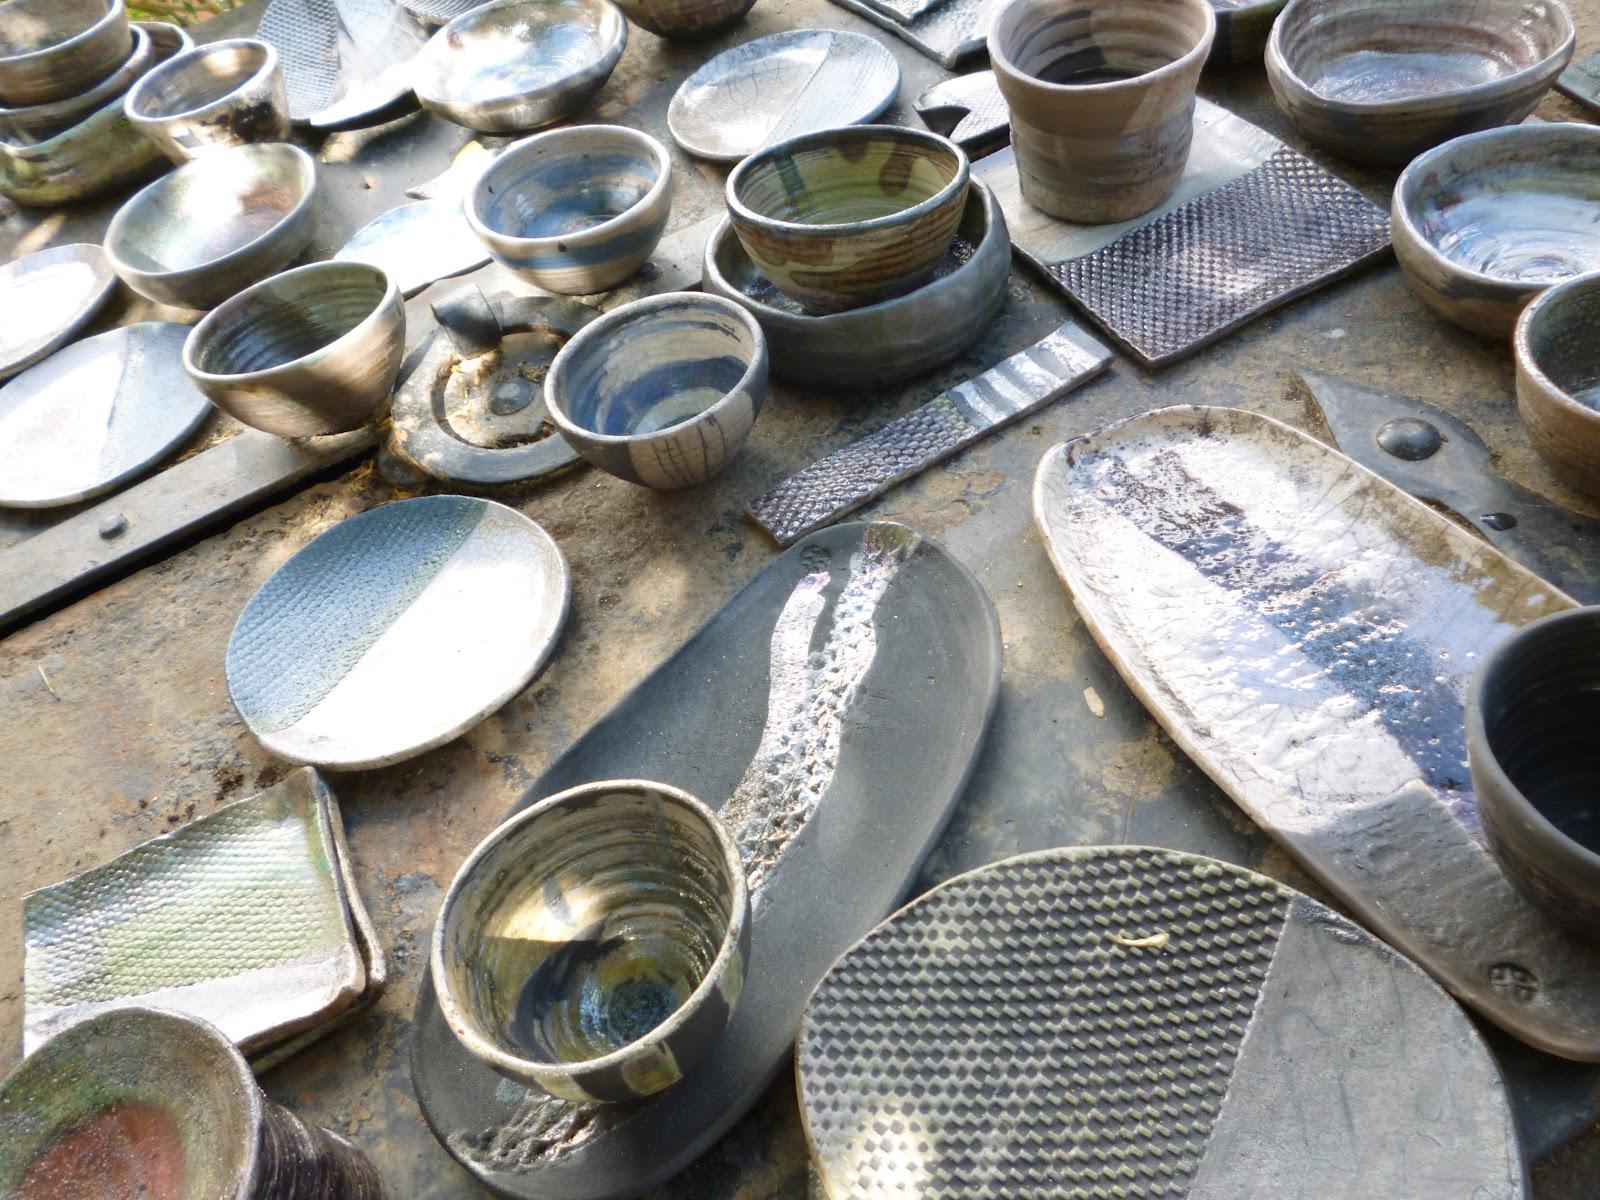 Espai ku curso intensivo de cer mica en semana santa en rioja for Curso ceramica madrid